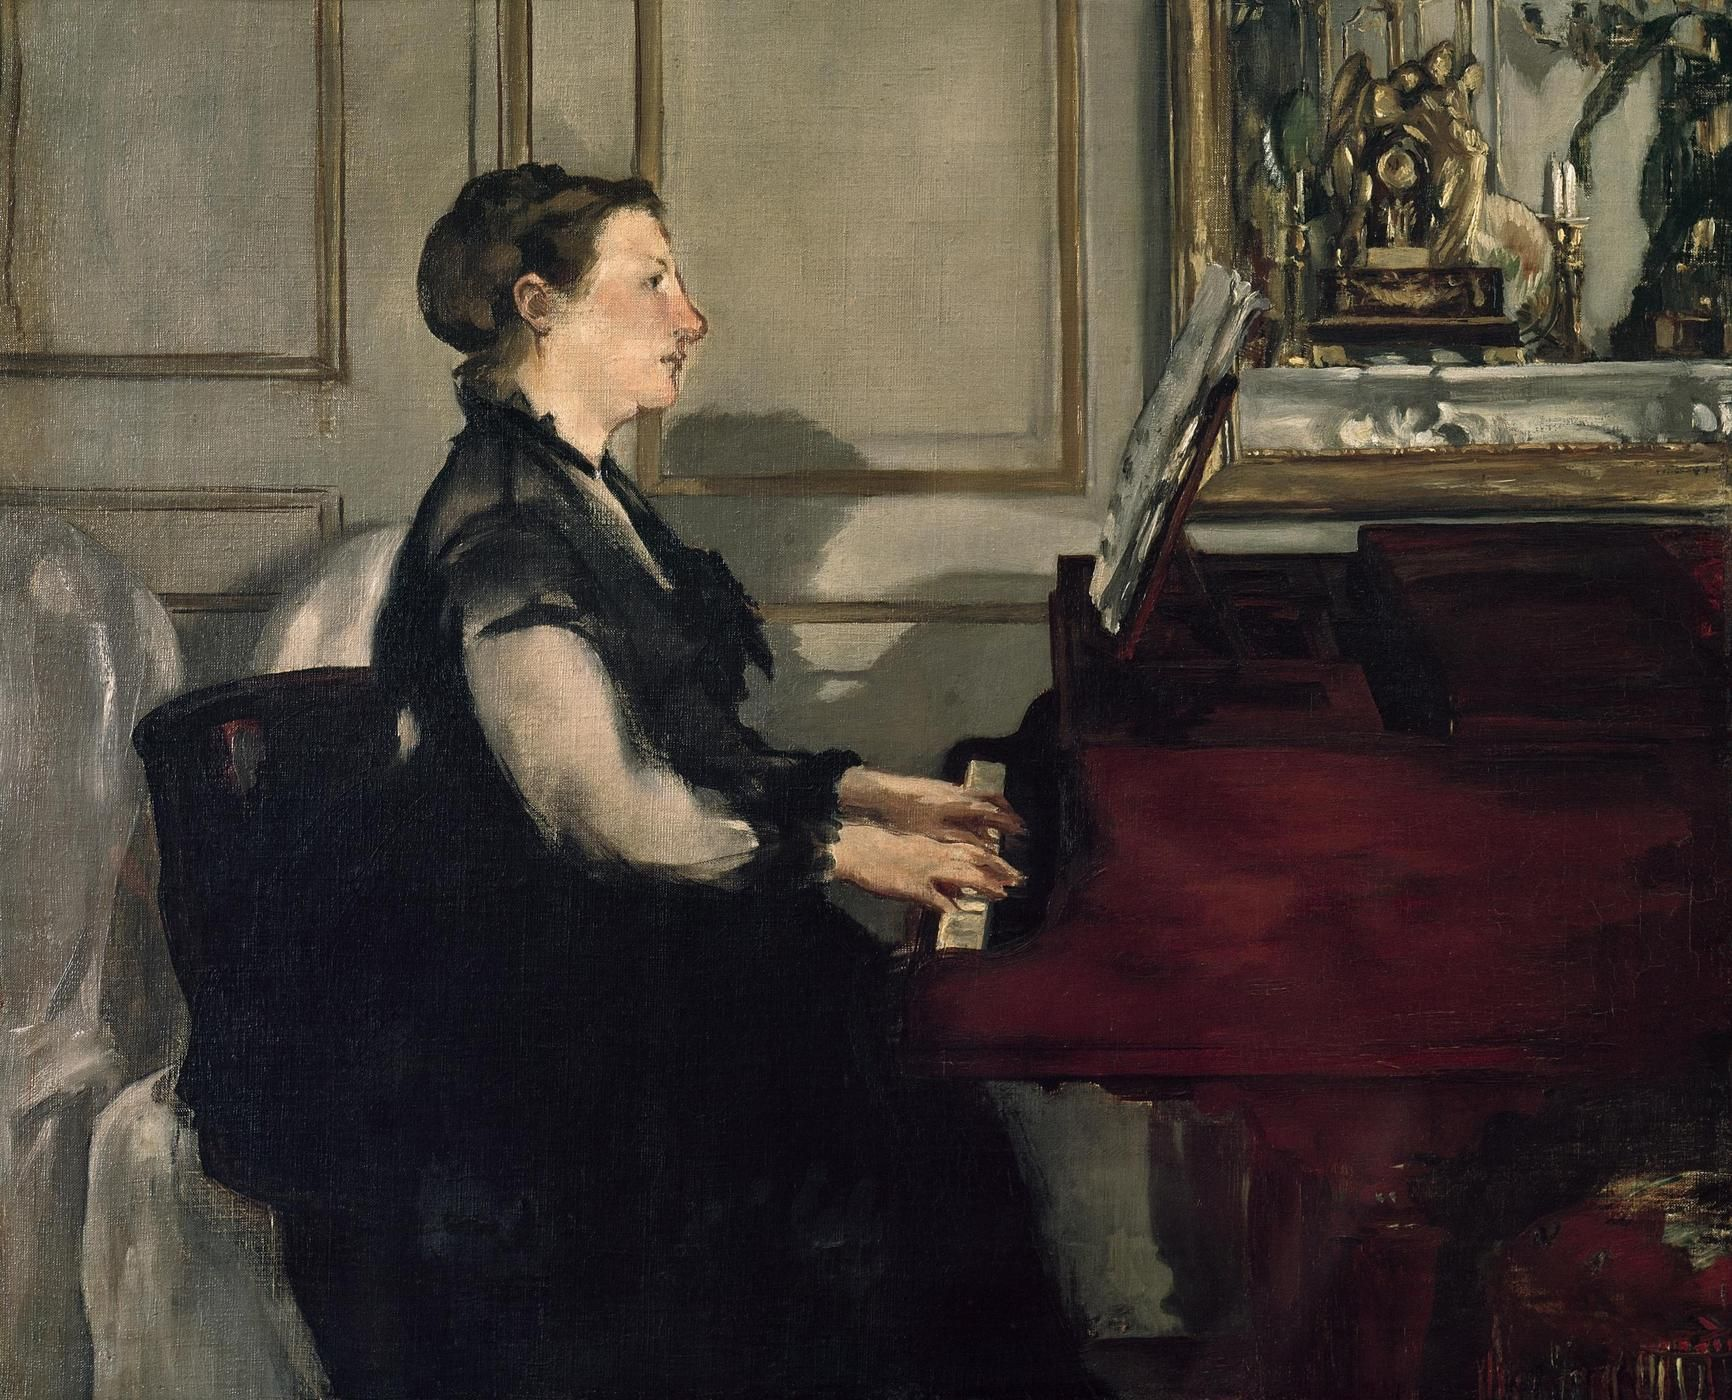 Édouard Manet - Madame Manet au piano   マネ, 絵画, 音楽